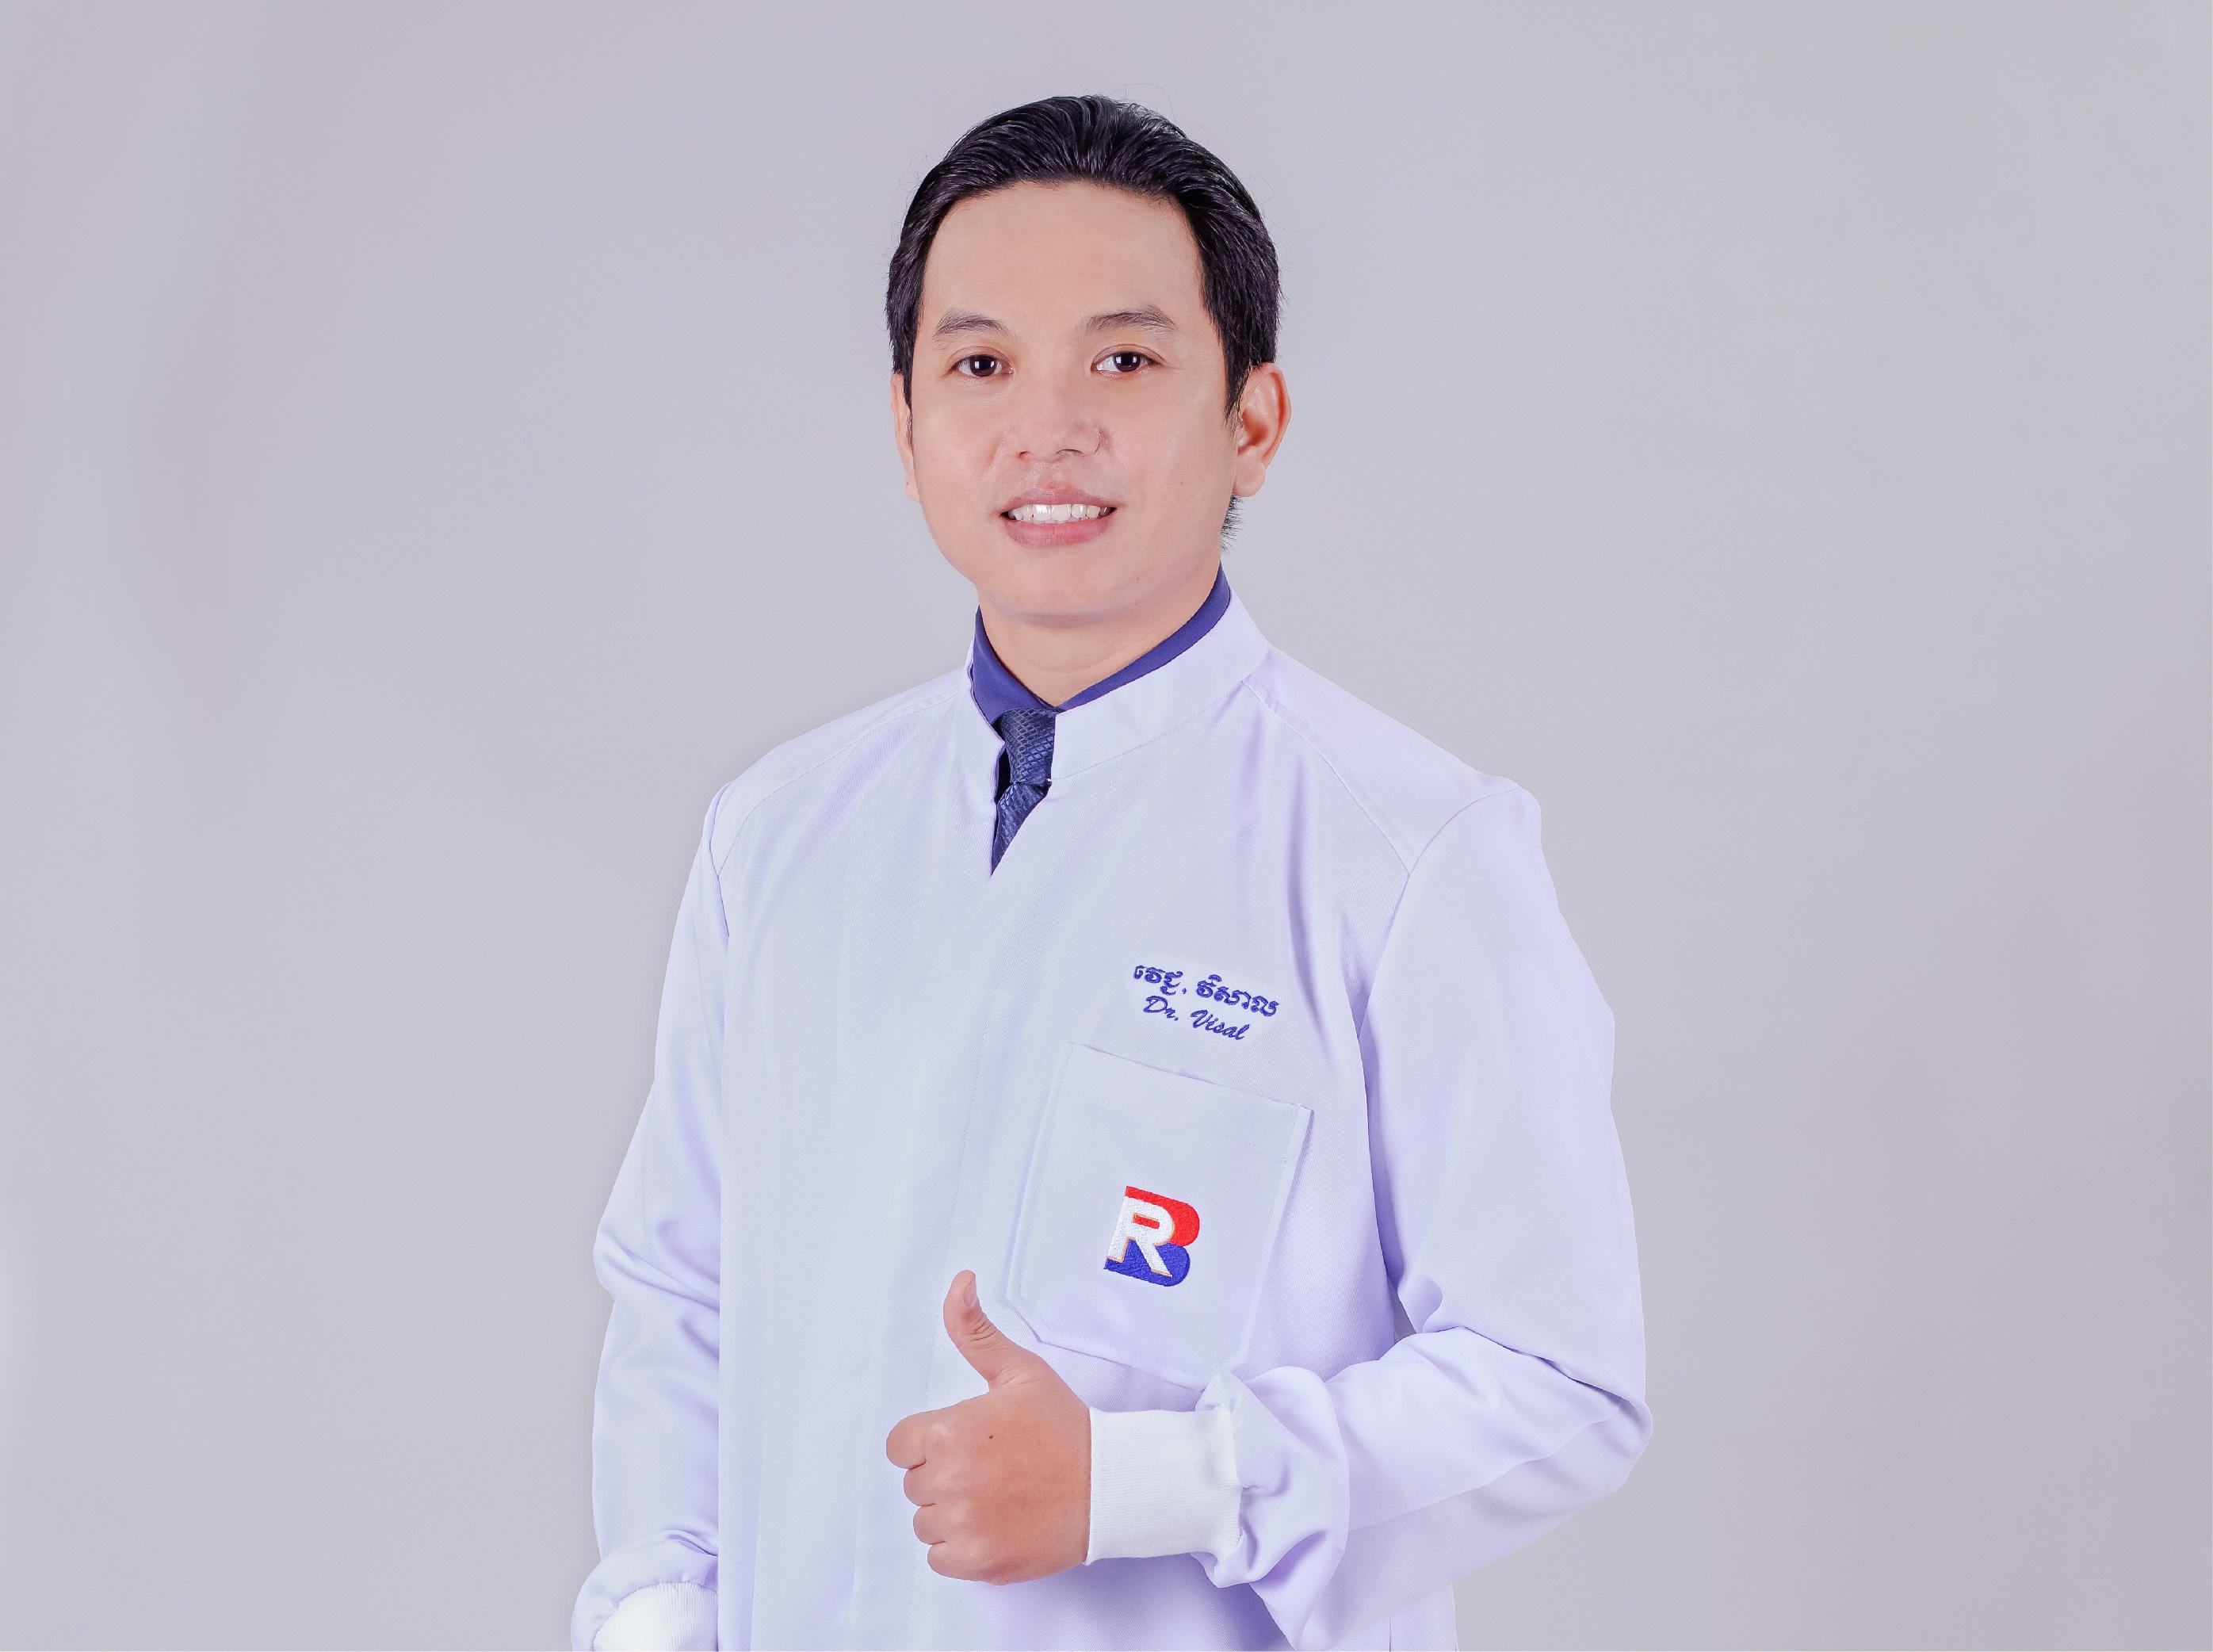 Dr. Soeurn Visal